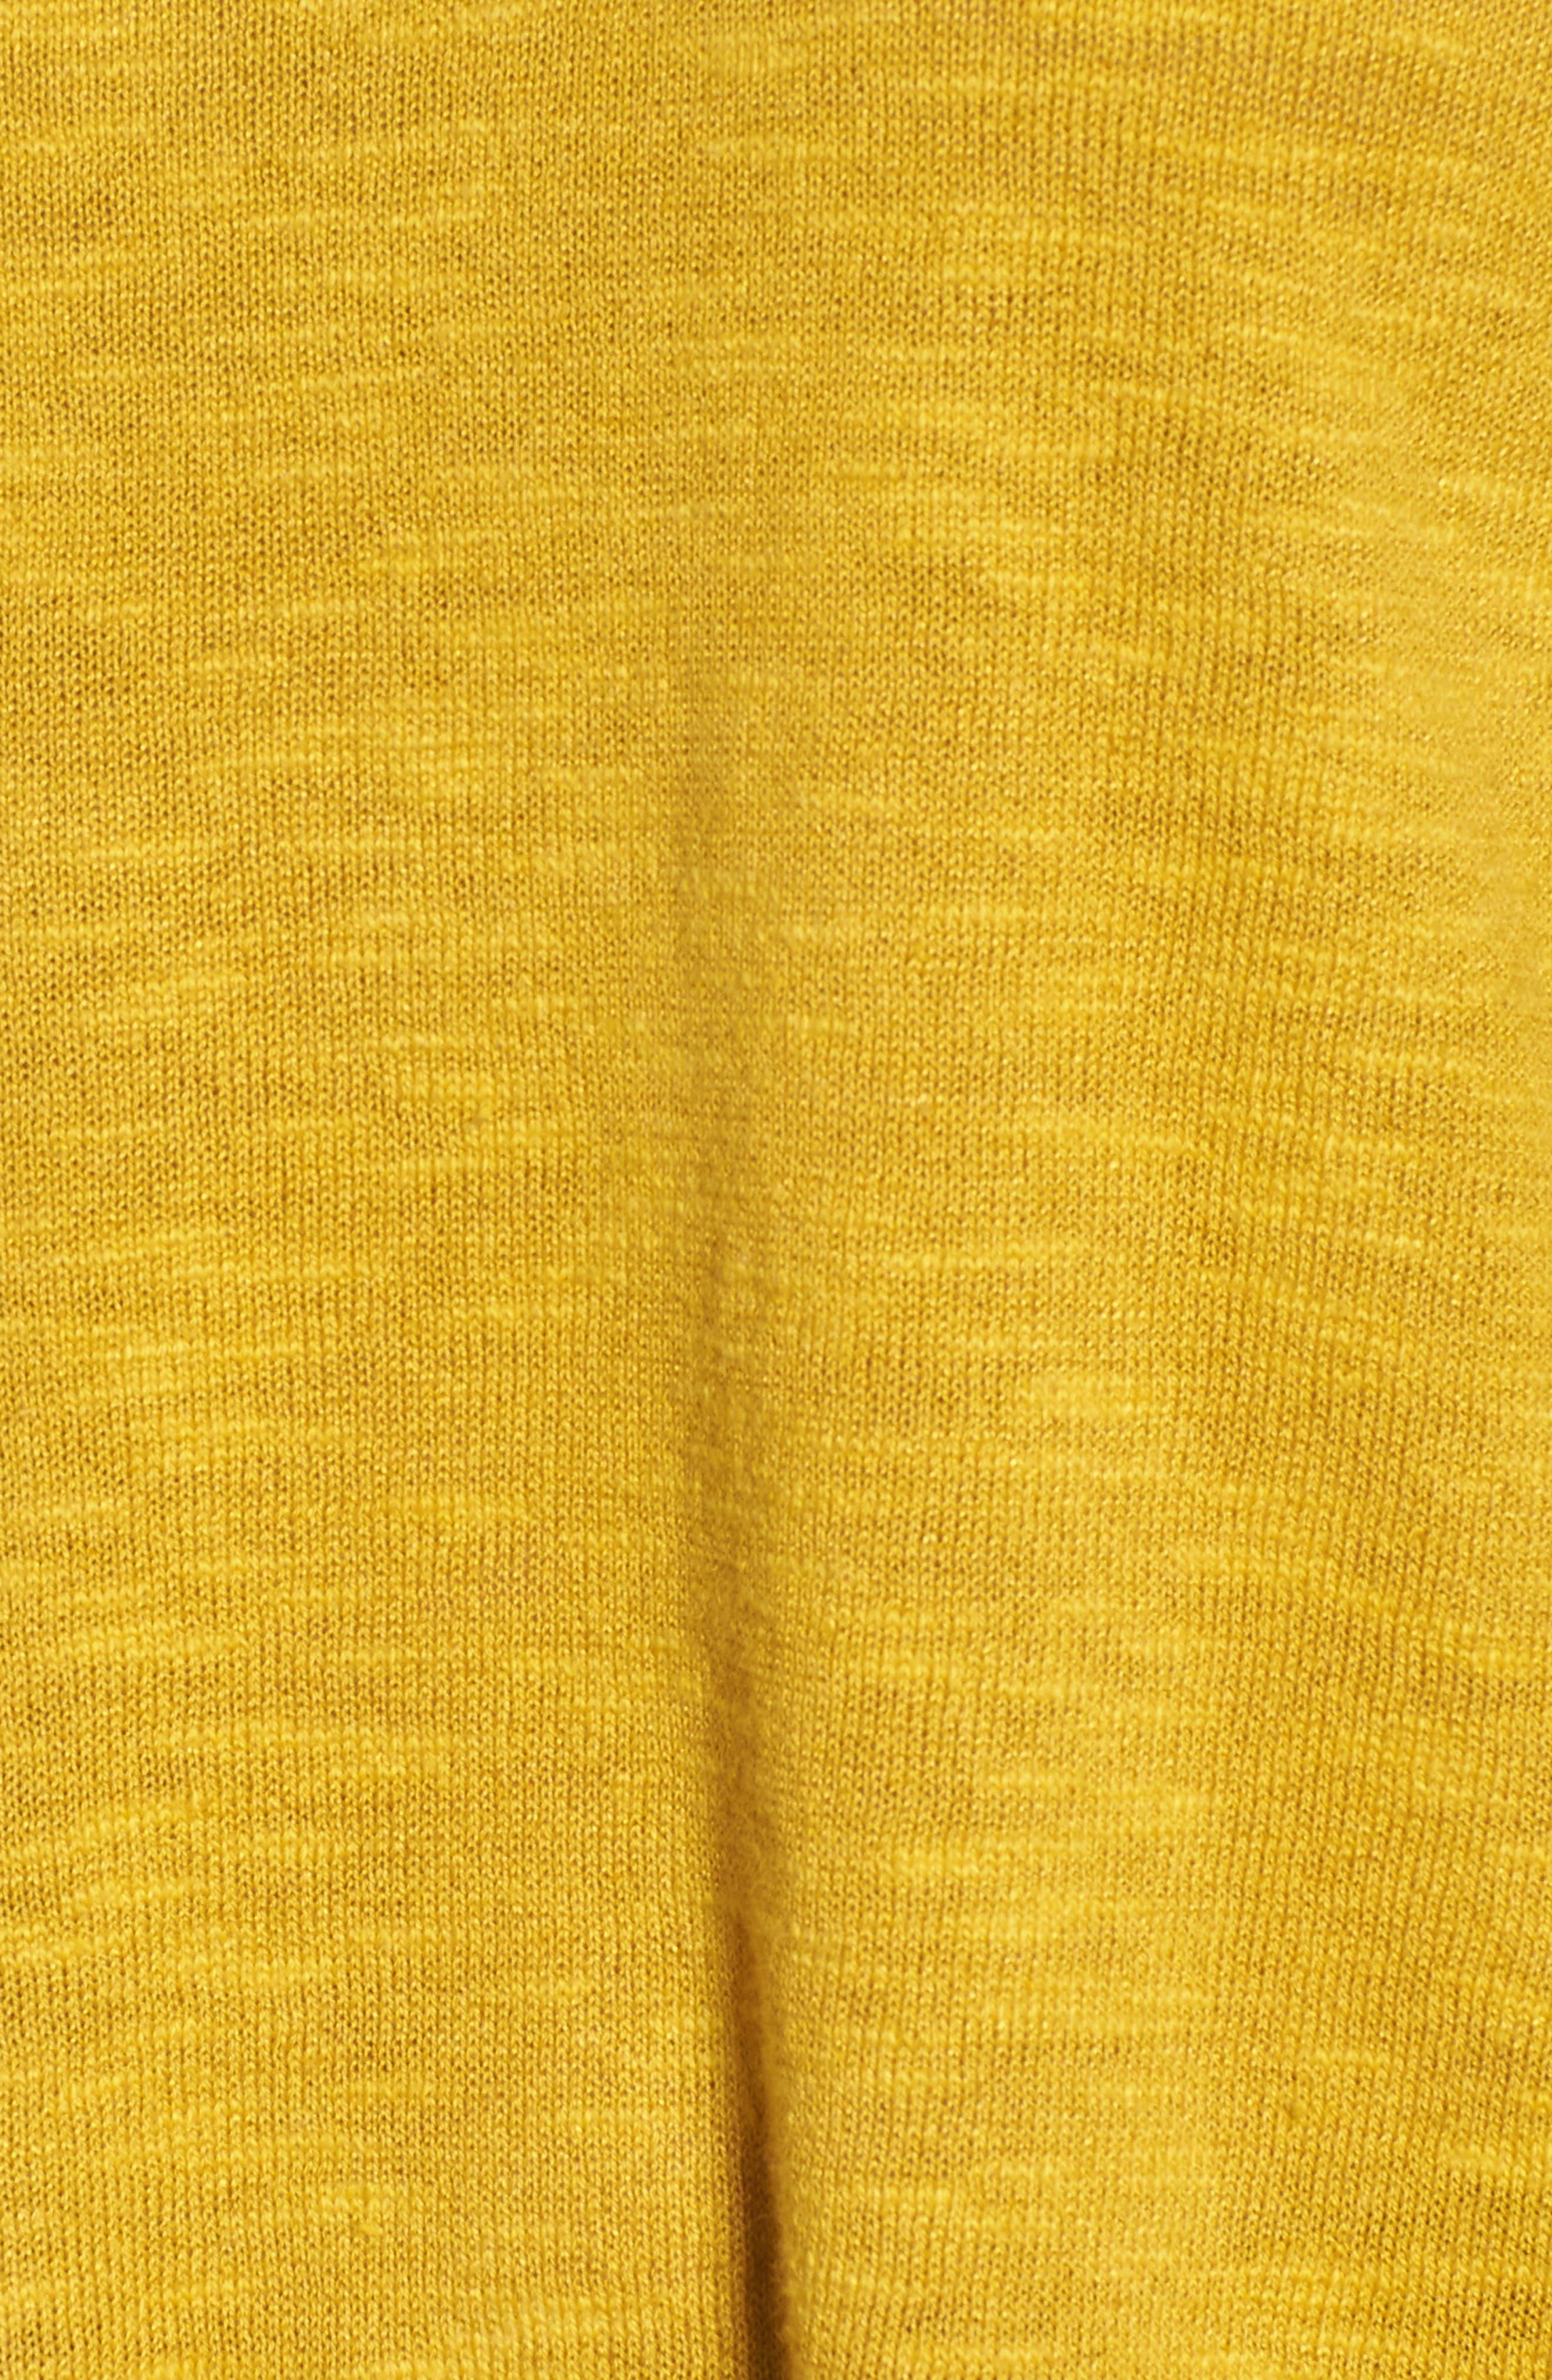 Organic Knit Crewneck Tunic Top,                             Alternate thumbnail 5, color,                             750